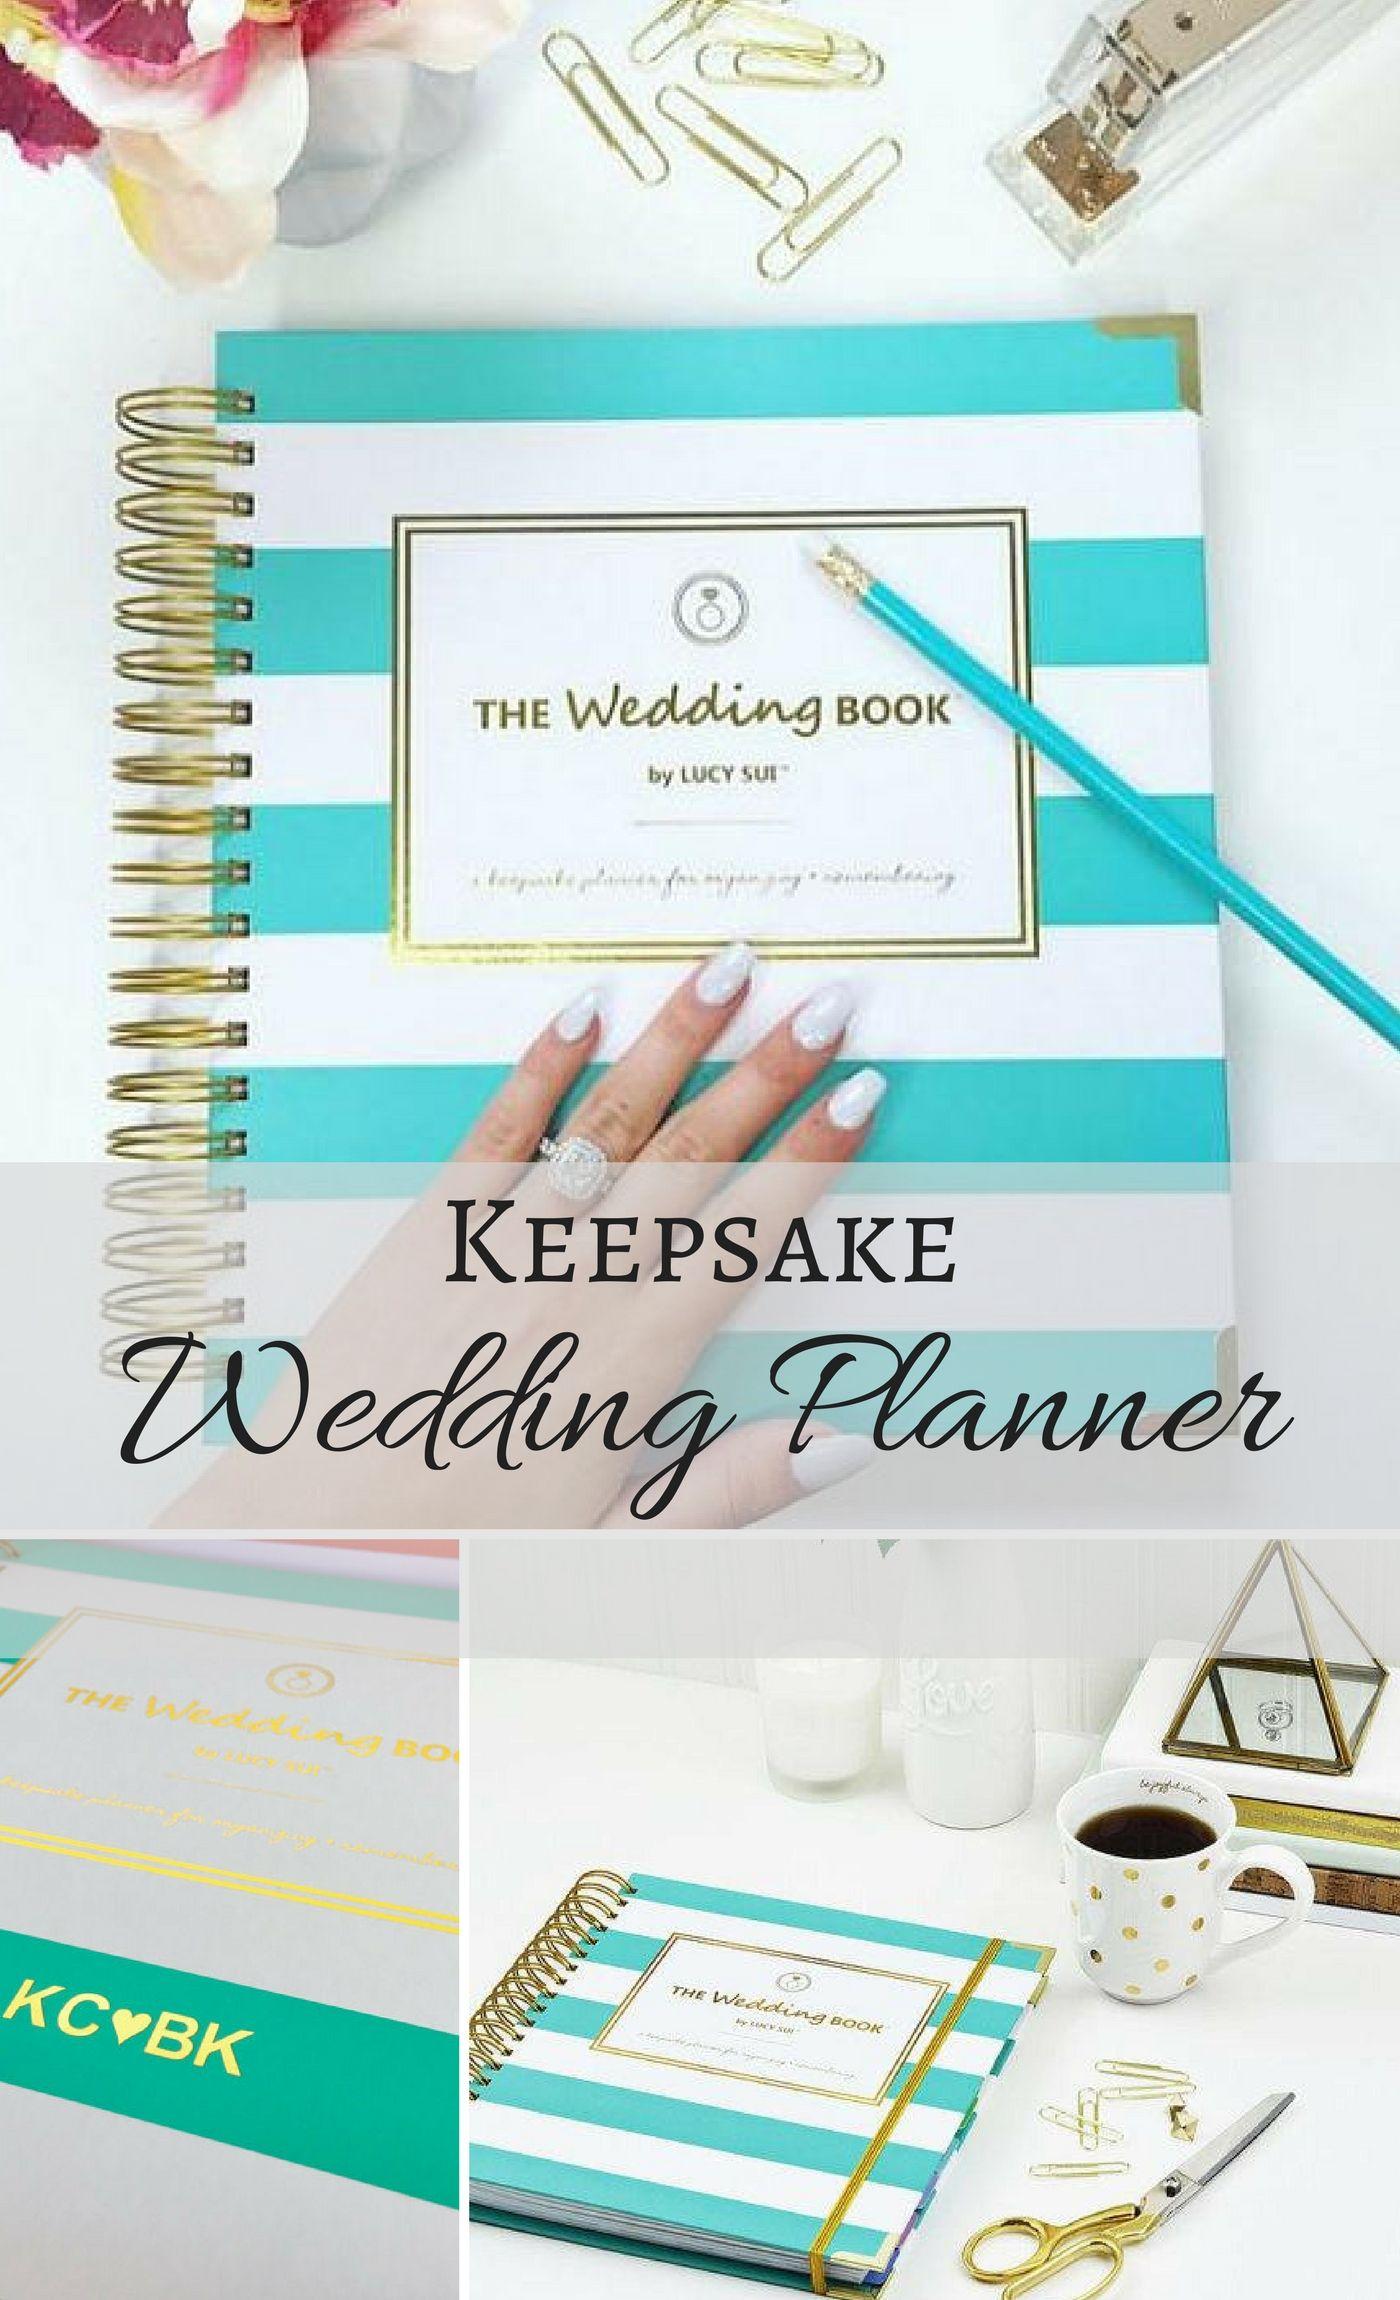 Keepsake Wedding Planner Book Monogrammed Planning Guide Engagement